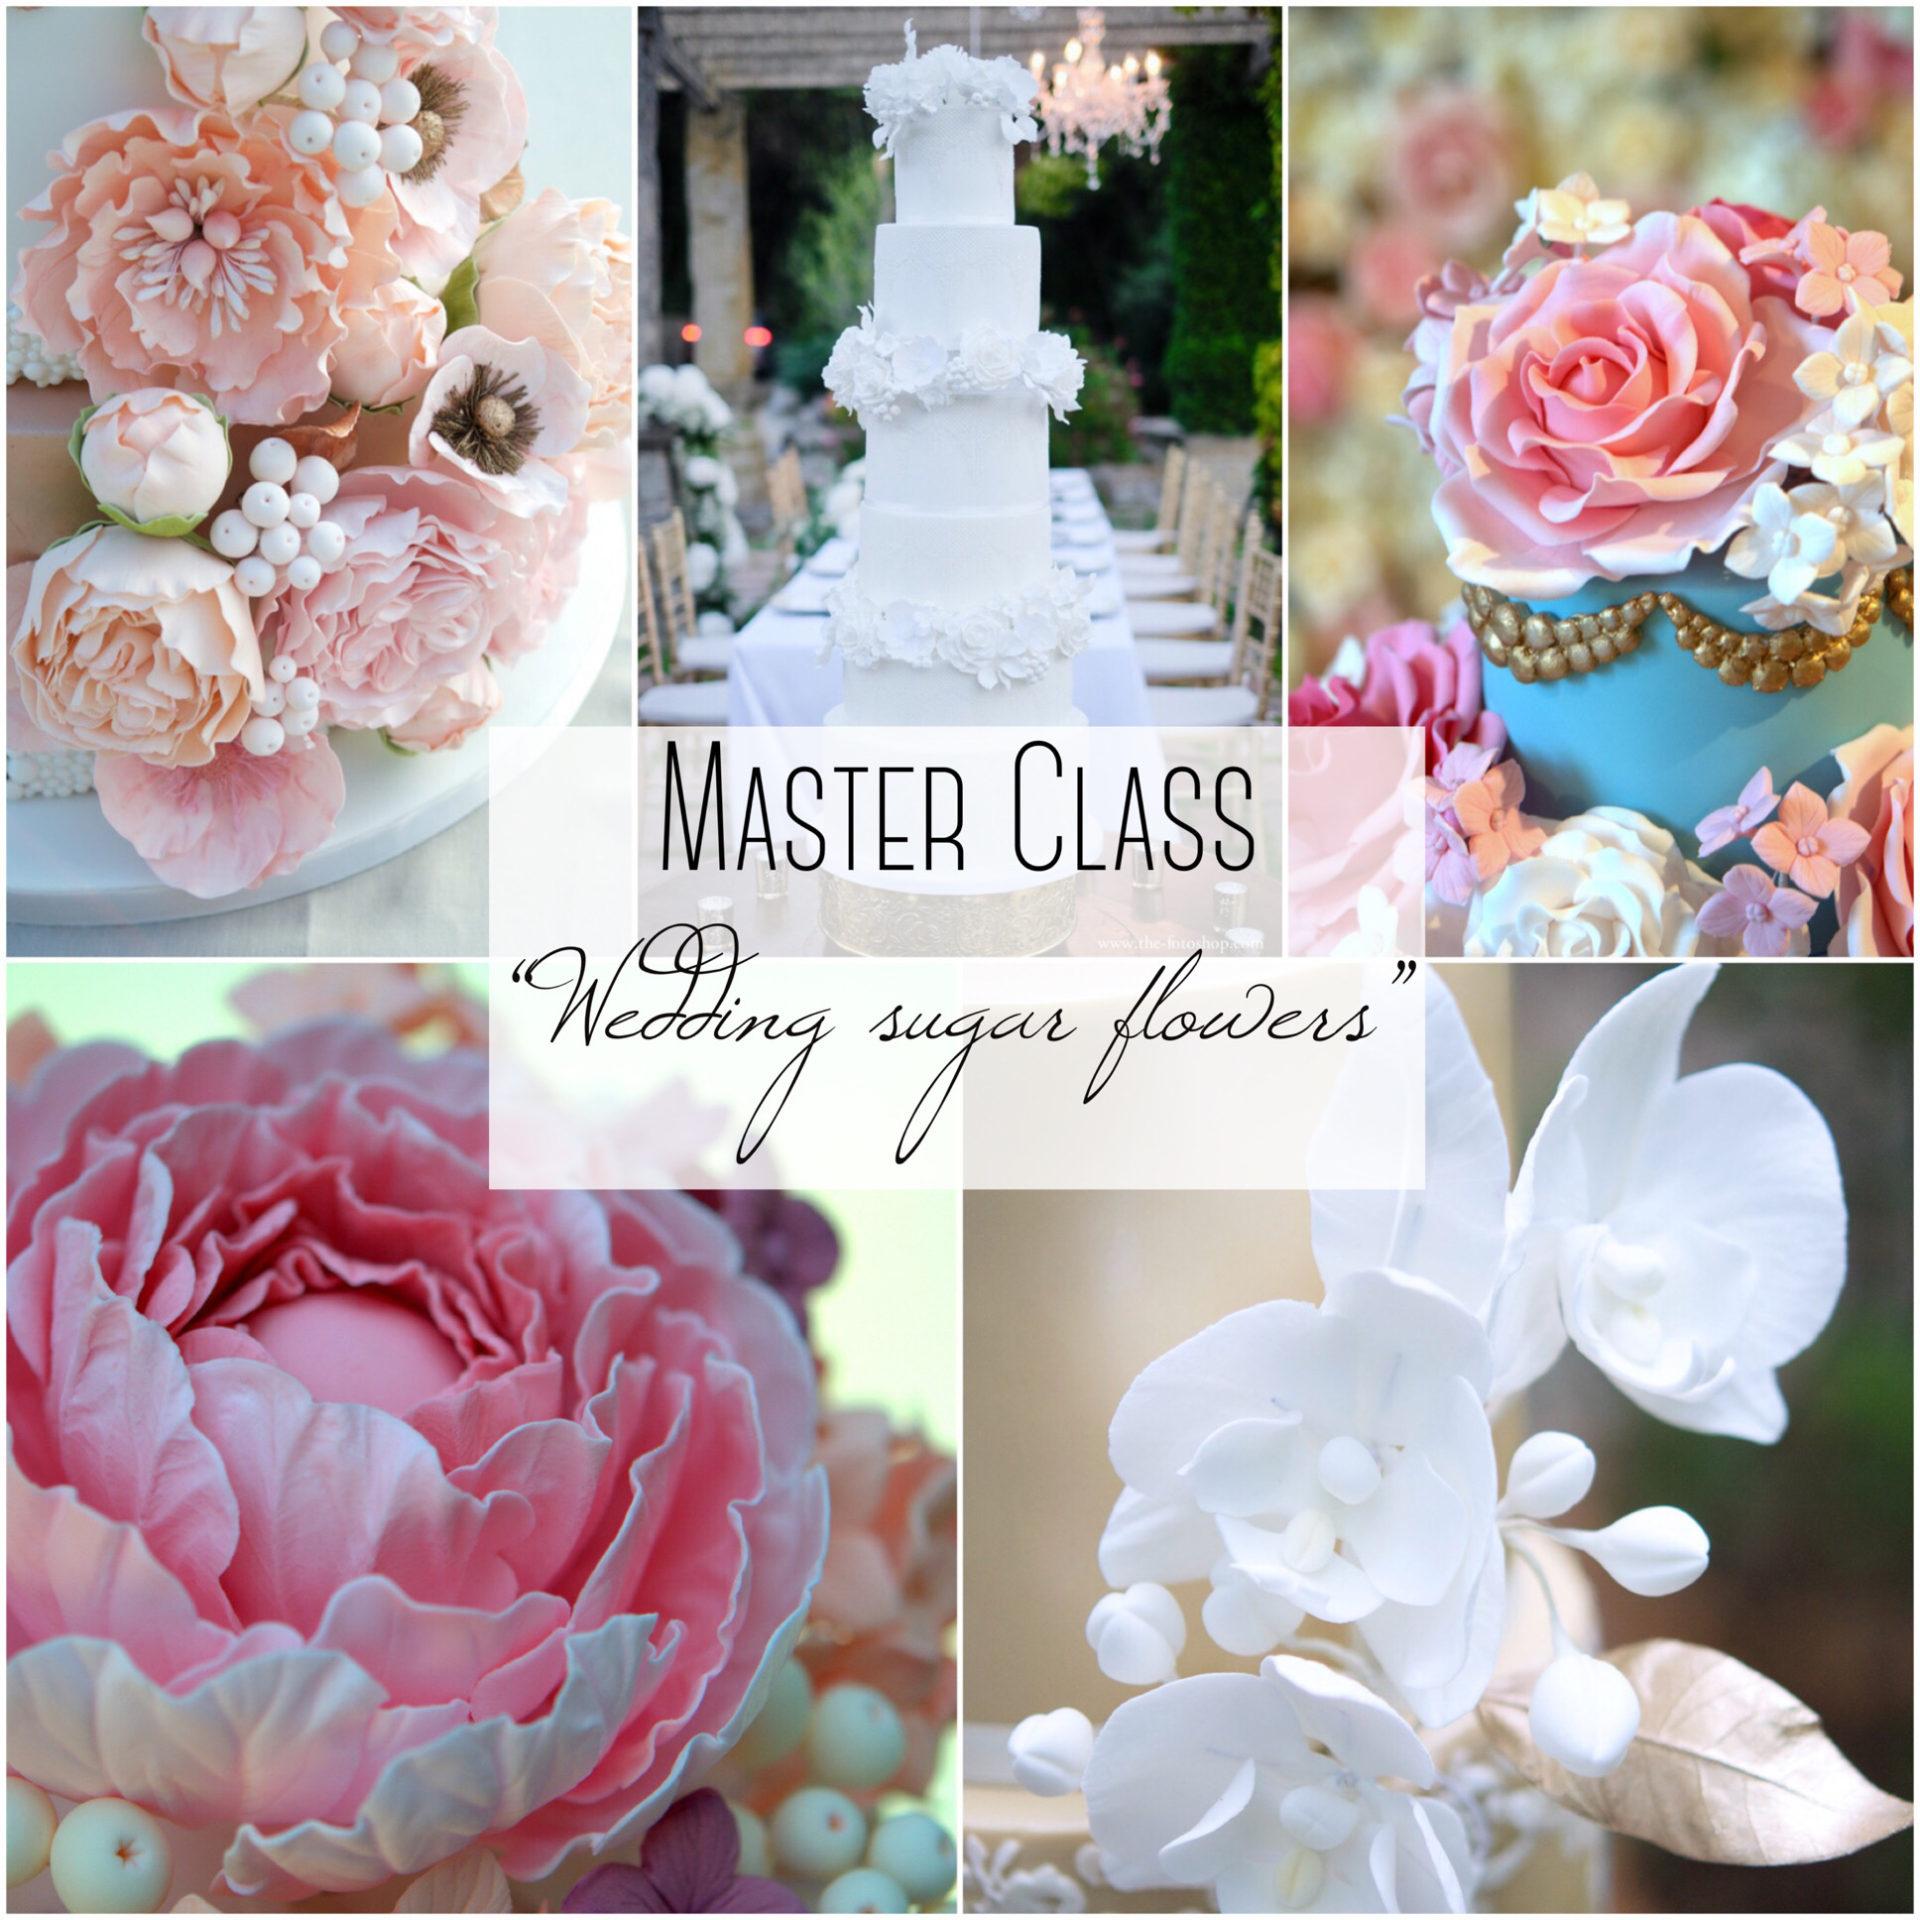 Master Class Flores de azucar, sugarflowers, curso reposteria, barcelona, mericakes, flores de azucar, pasta de goma, gumpaste, 1